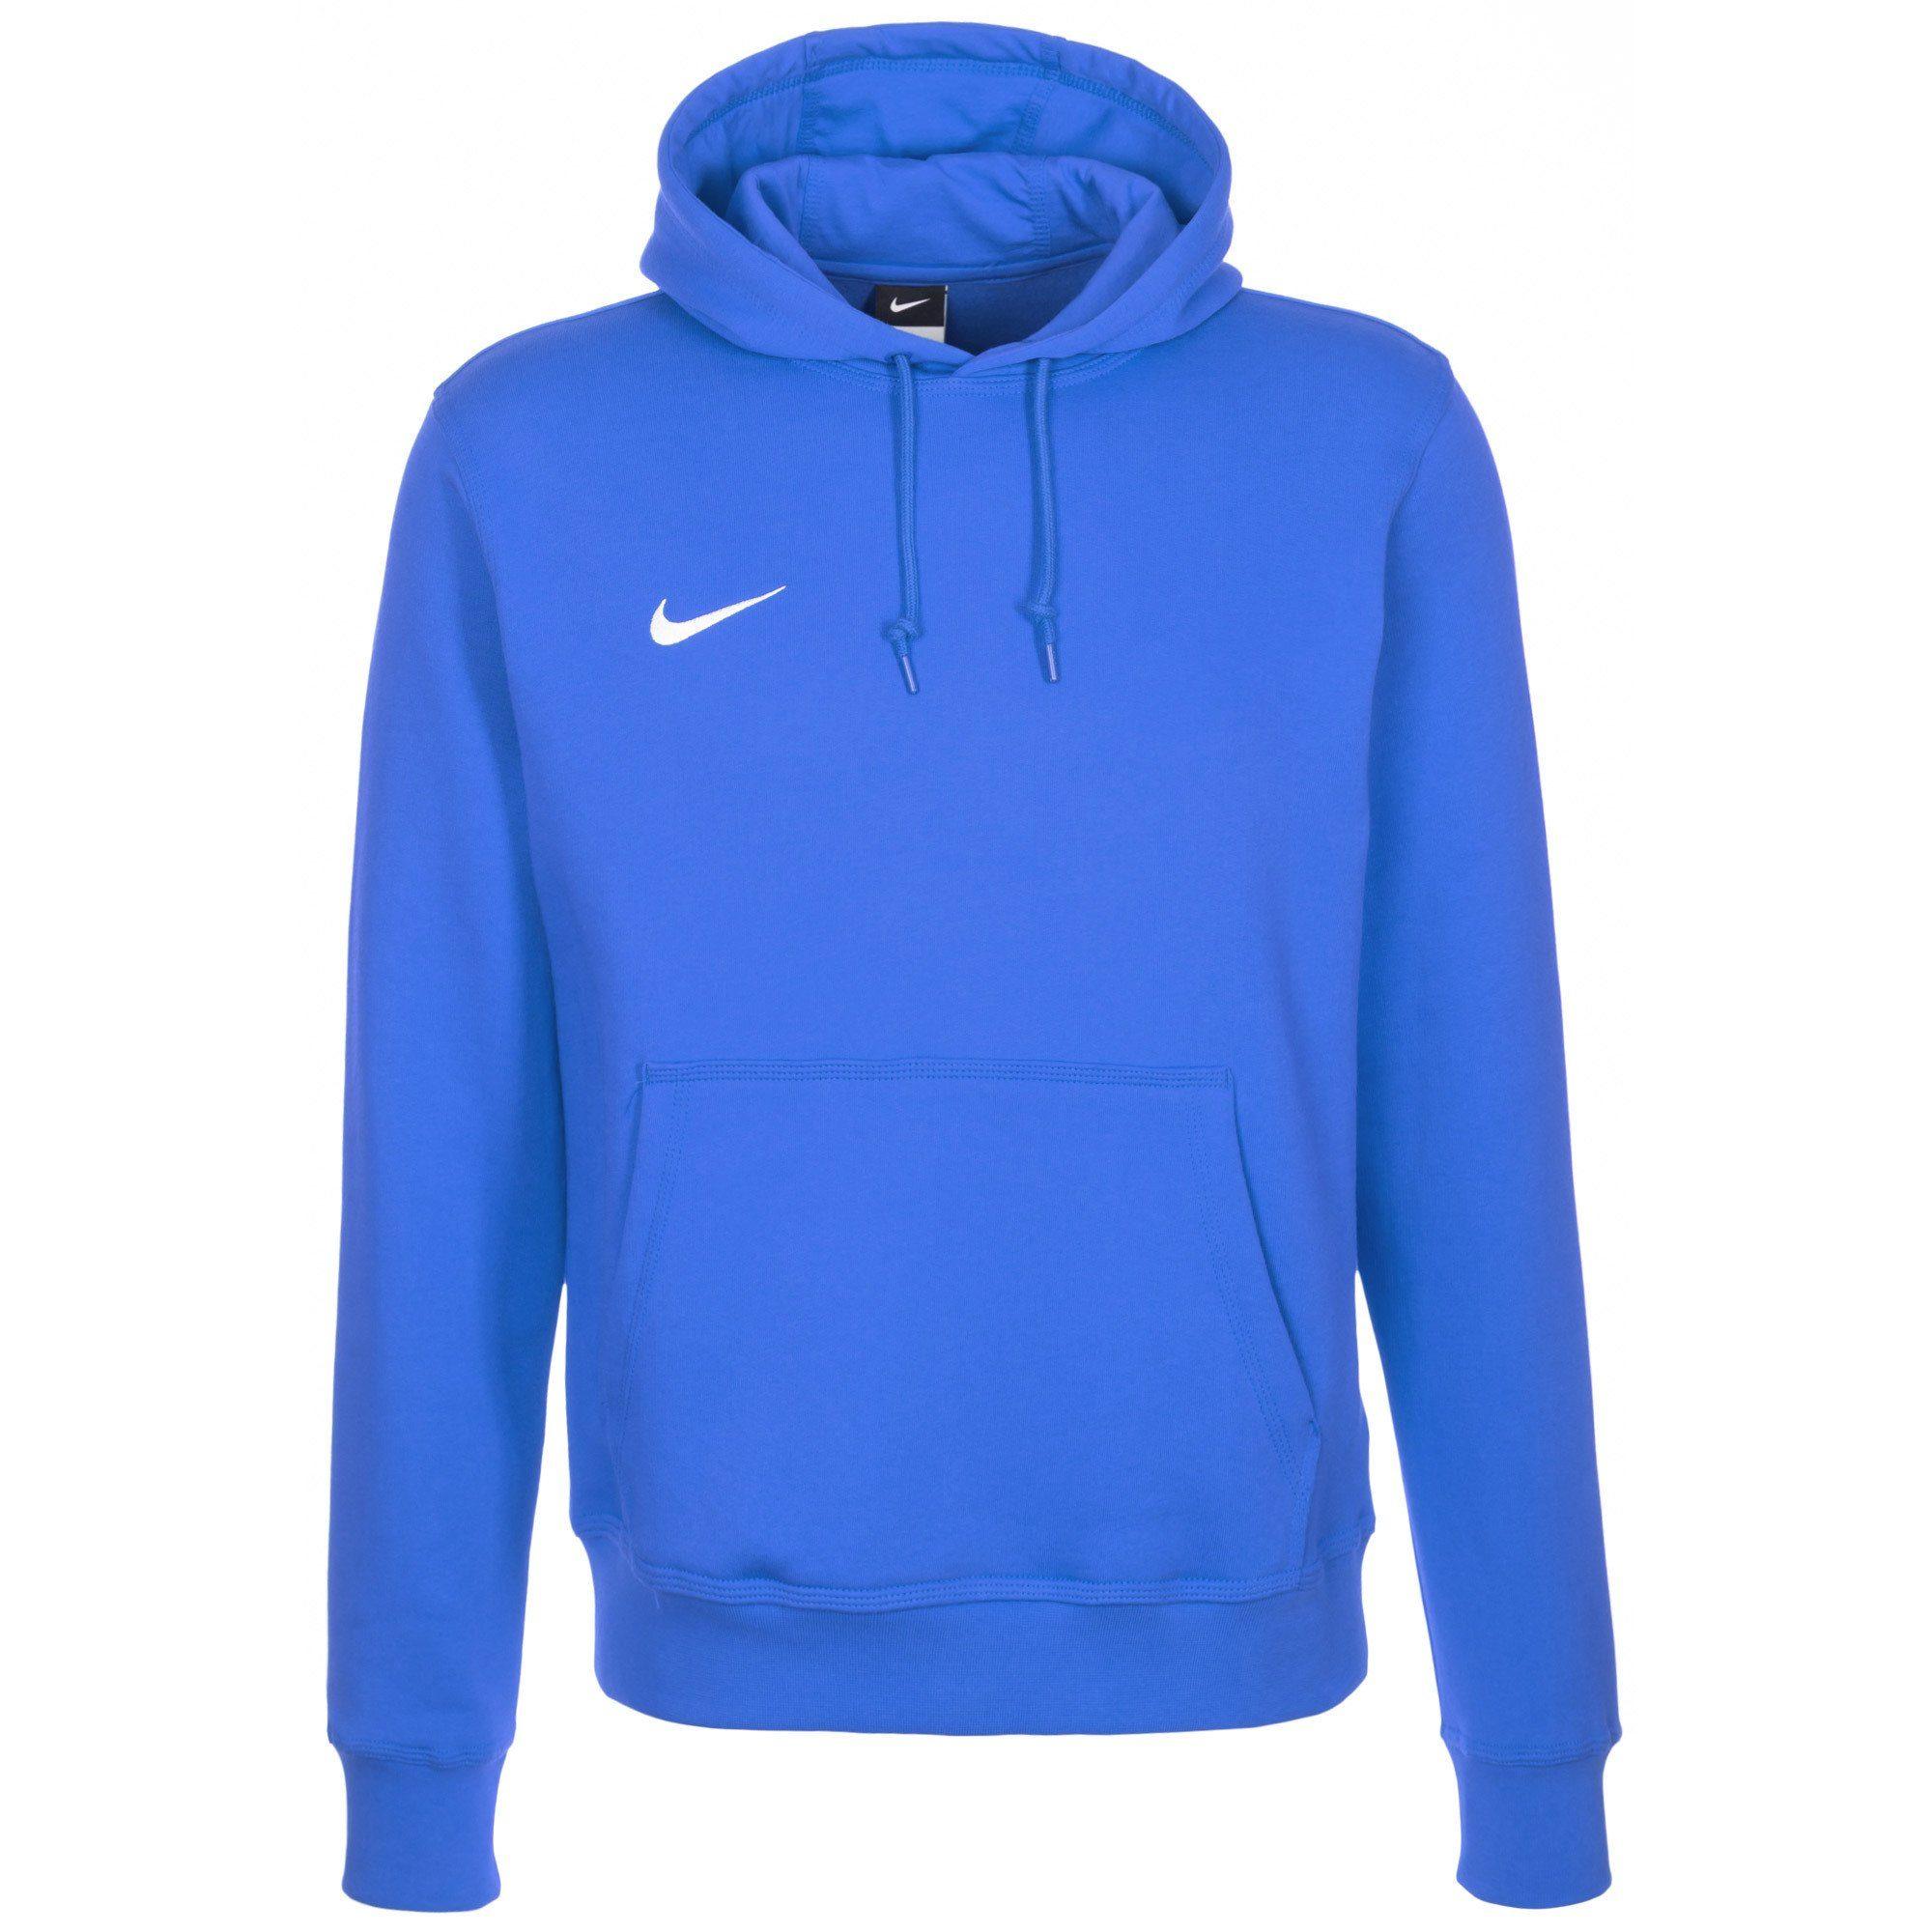 d5a6c0423d95 Nike Kapuzenpullover »Nike Team Club Trainingskapuzenpullover Herren«